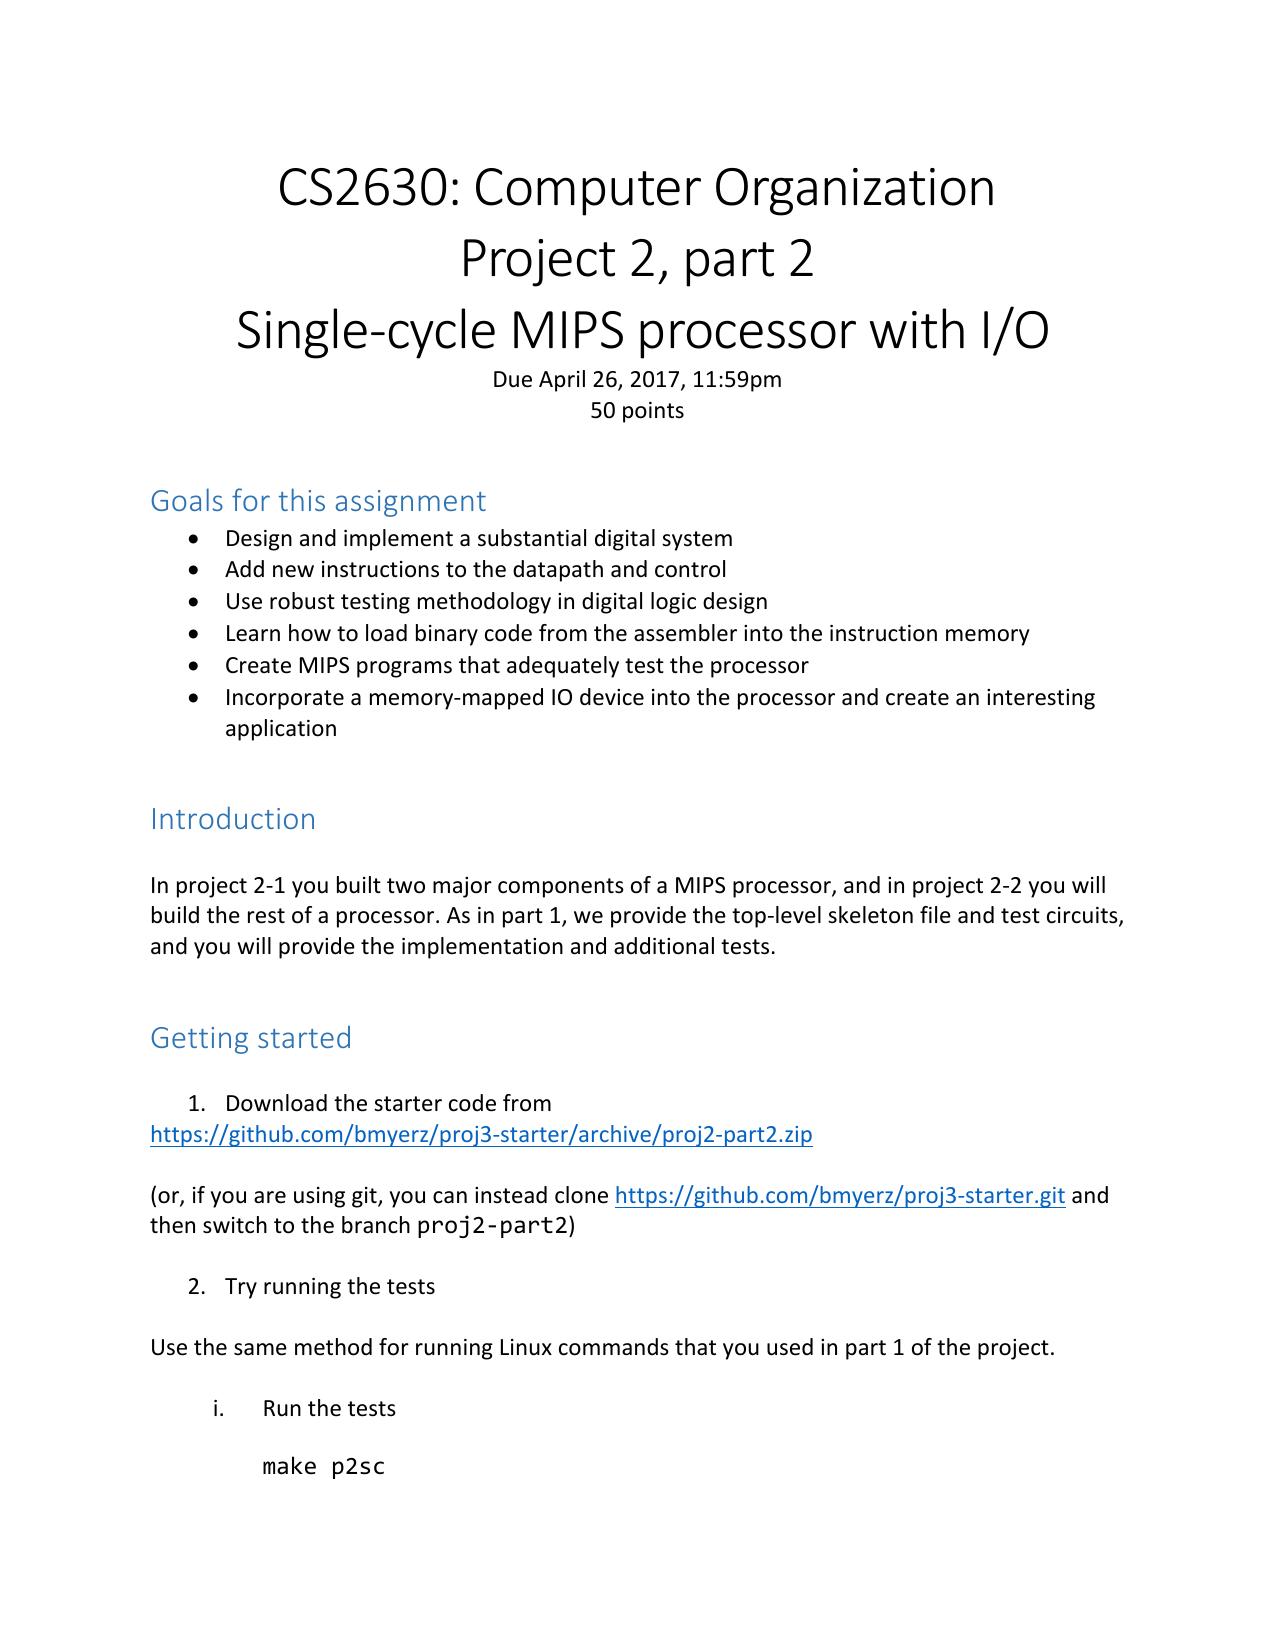 CS2630: Computer Organization Project 2, part 2 - Iowa